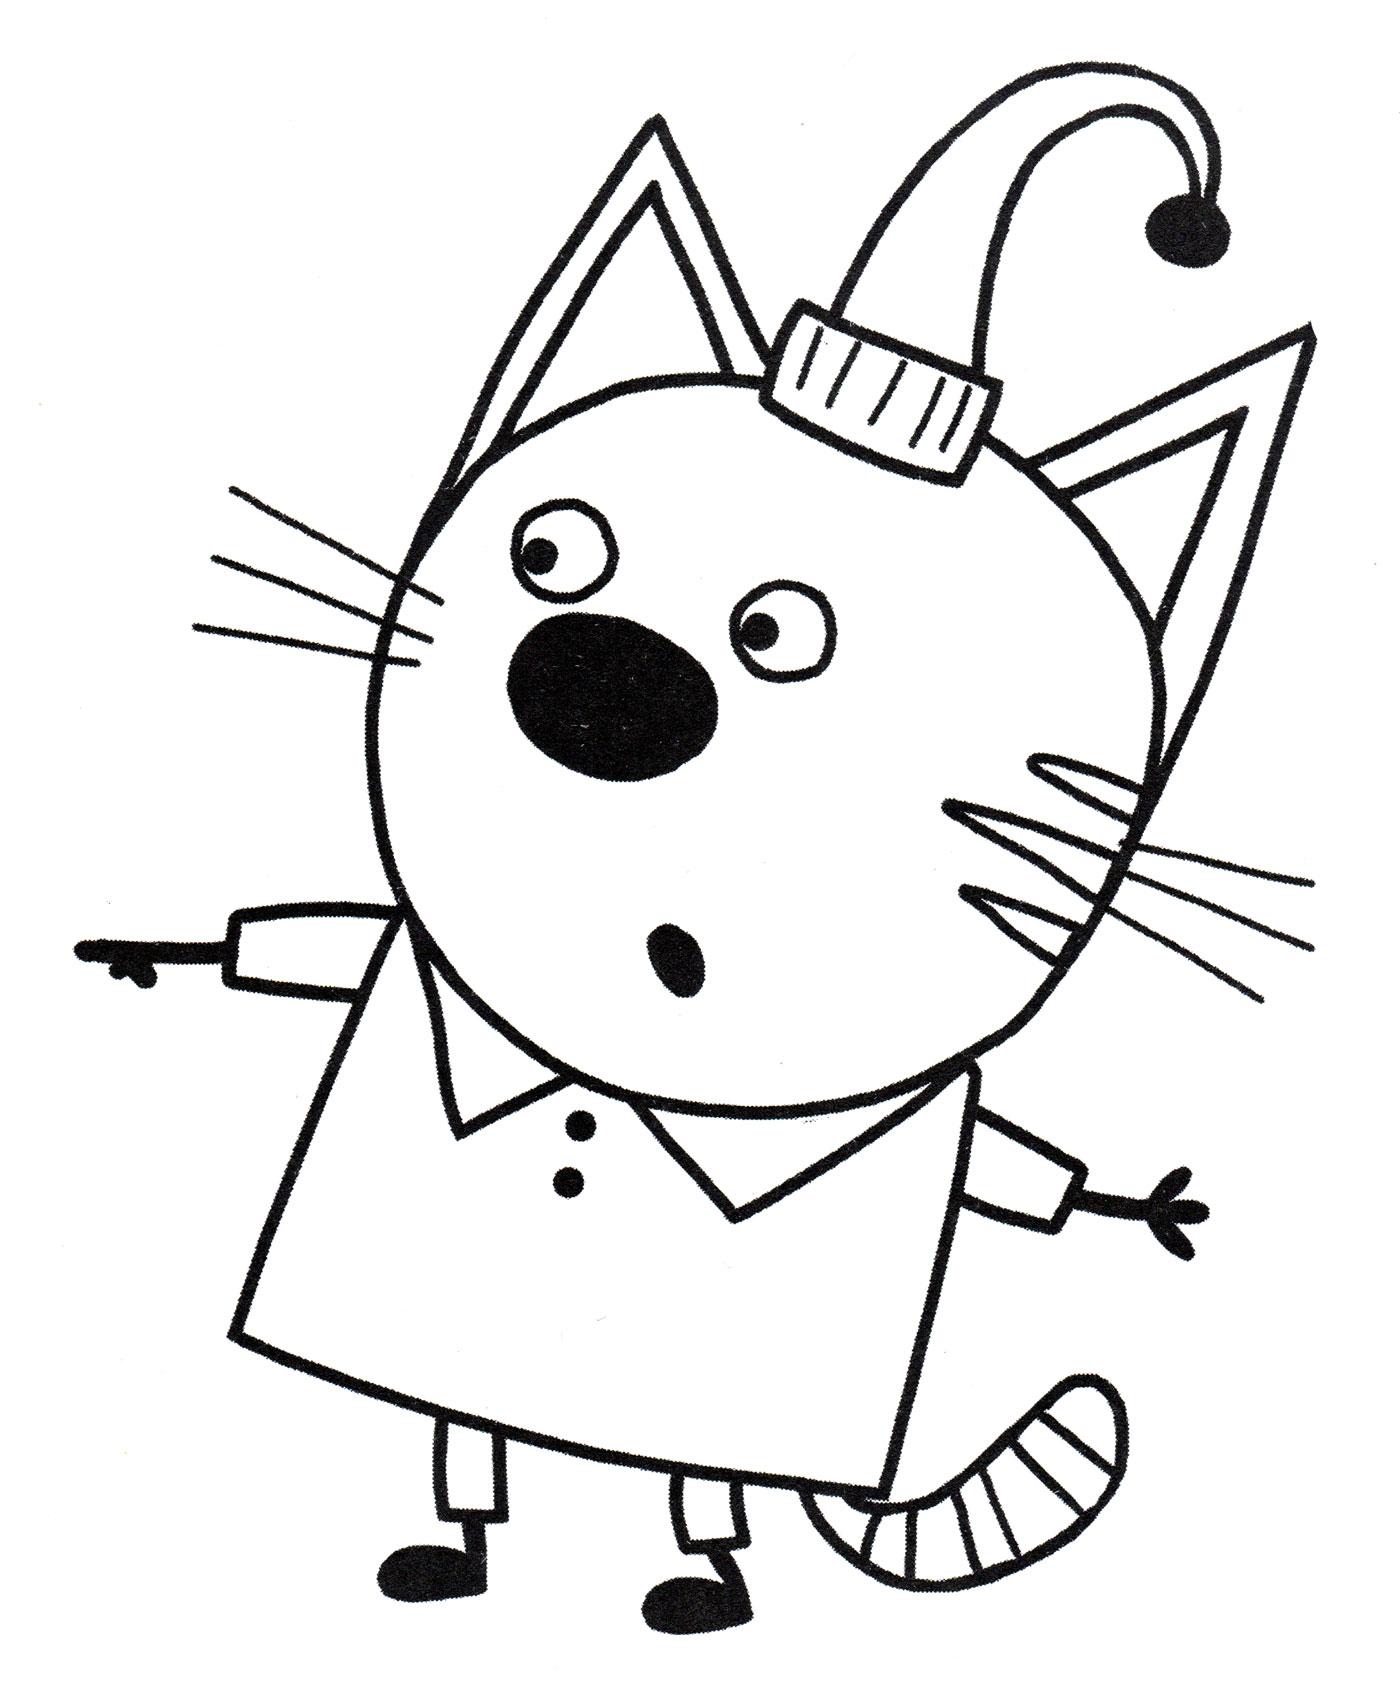 Раскраска Компот что-то увидел | Раскраски Три кота